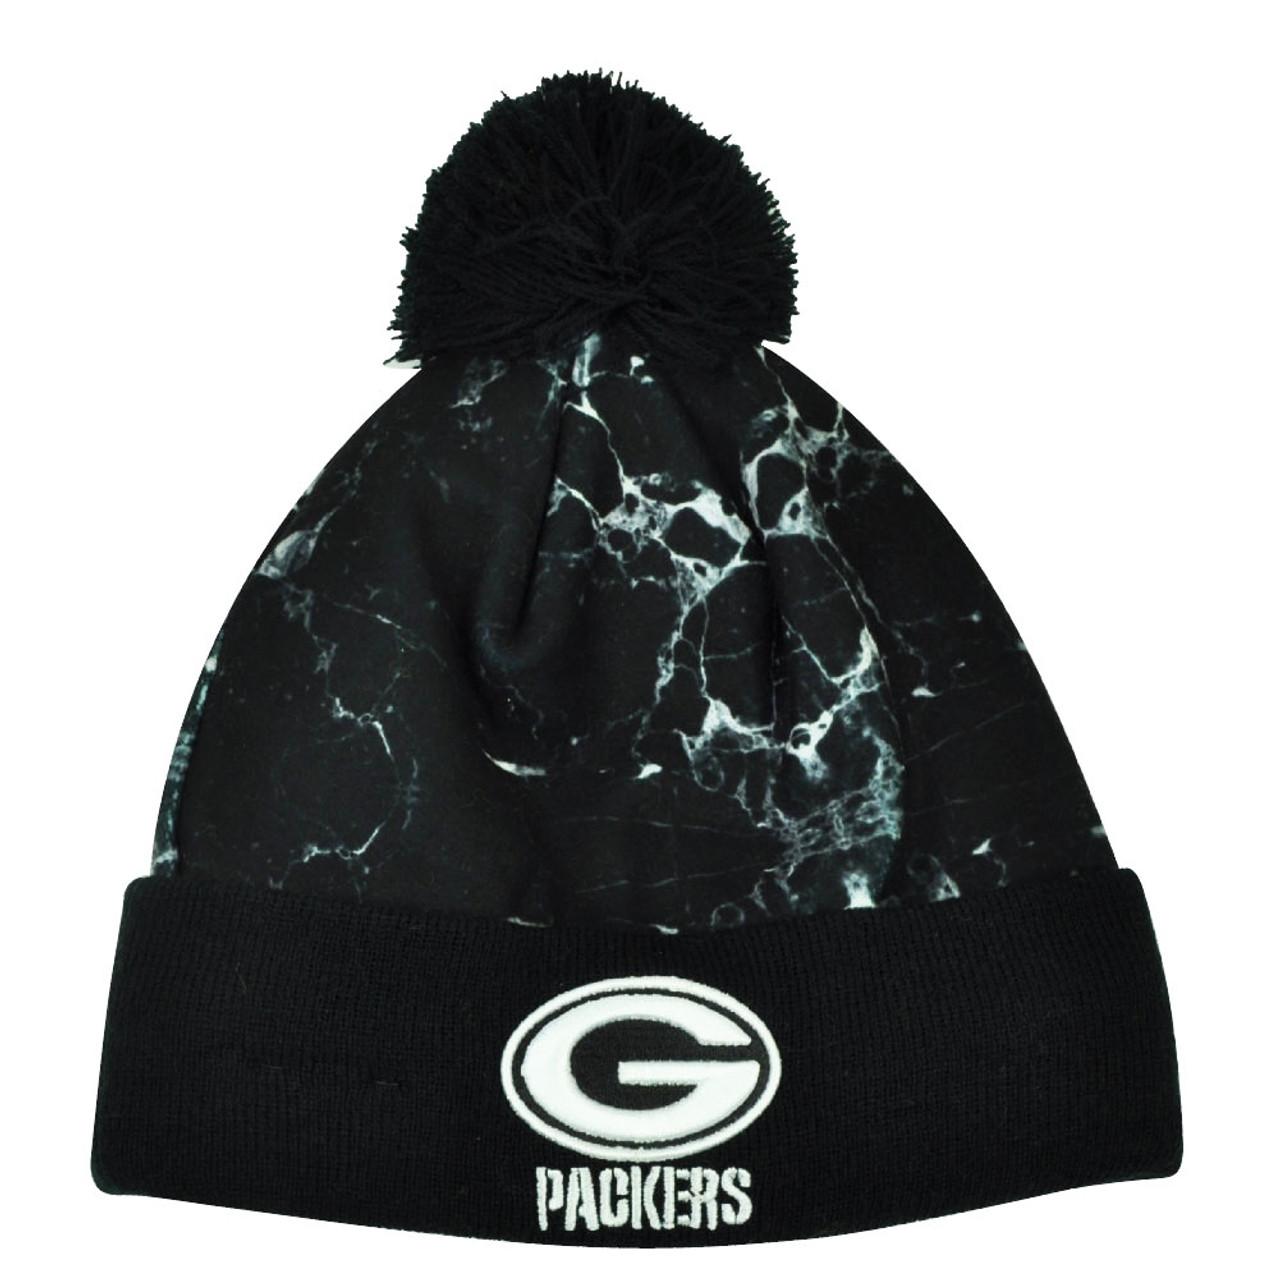 b79ae097f9b680 NFL New Era Marble Mix Green Bay Packers Cuffed Knit Beanie Toque Pom Pom  Black - Cap Store Online.com